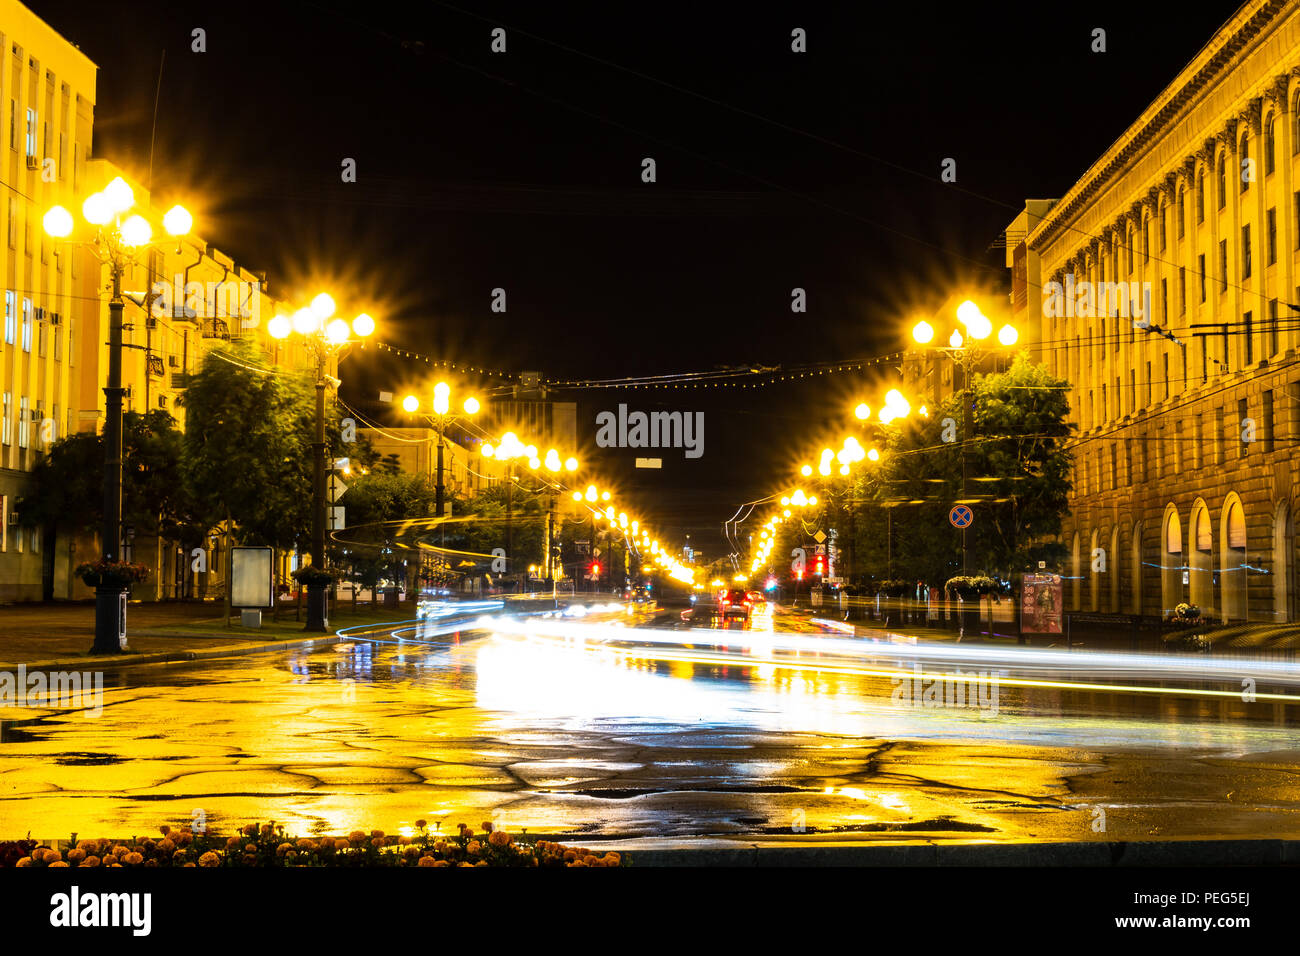 Khabarovsk, Russia - August 13, 2018: Lenin square at night under the light of lanterns. Stock Photo